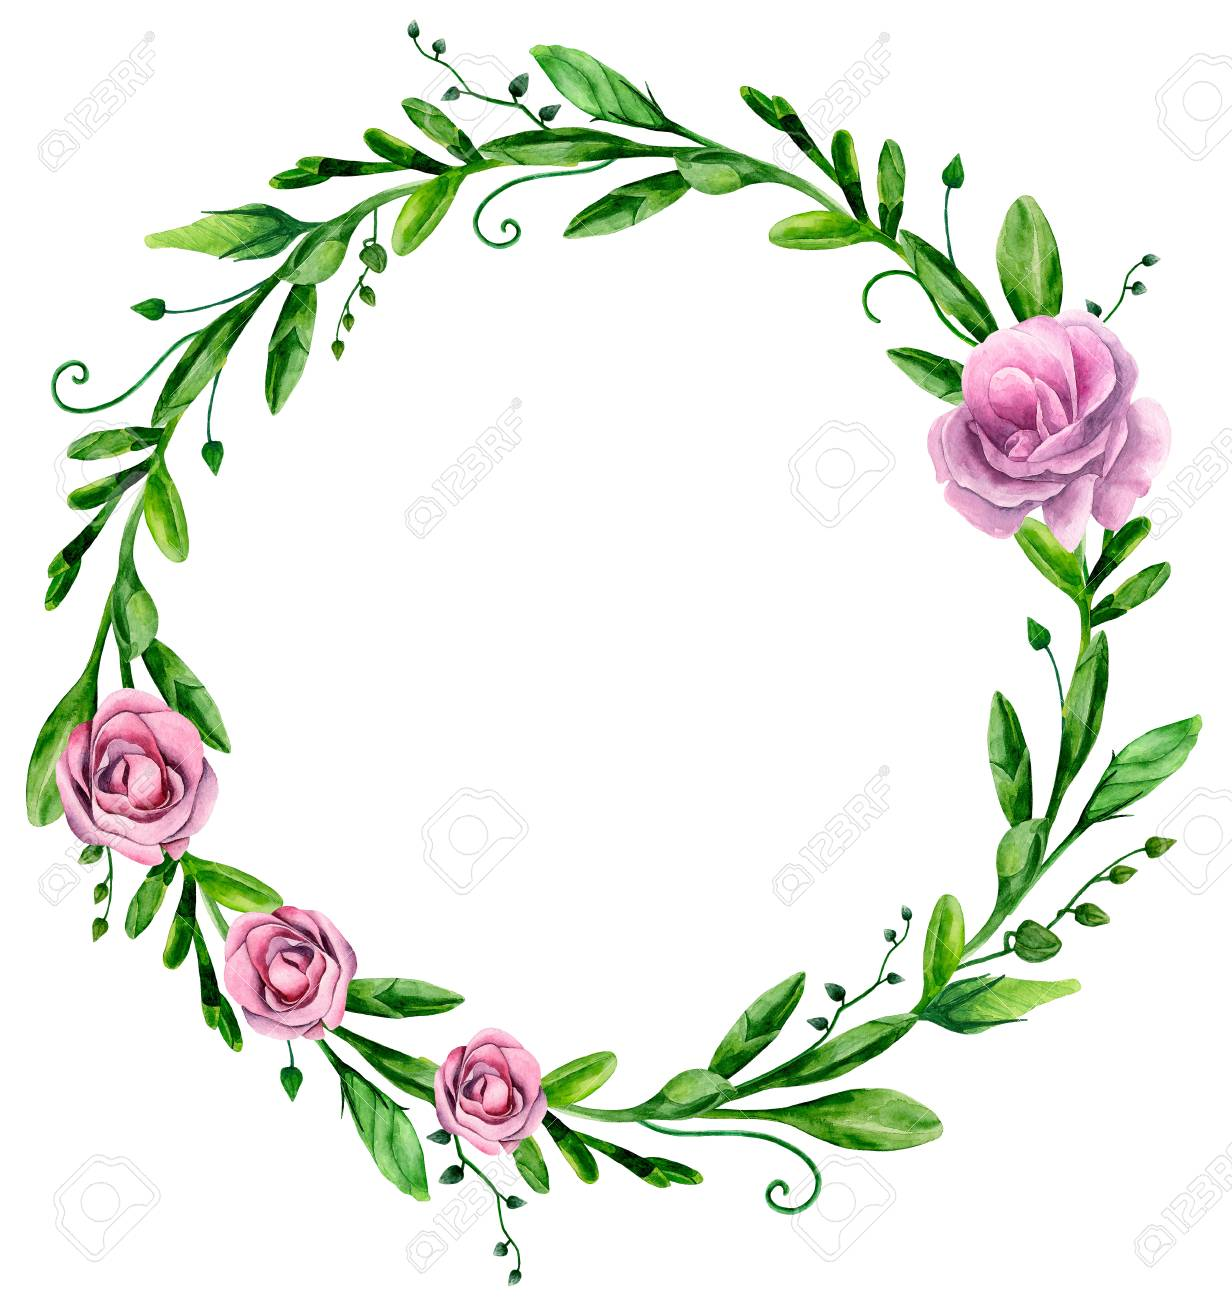 Watercolor Greenery Floral Arrangement Clip Art Stock Photo